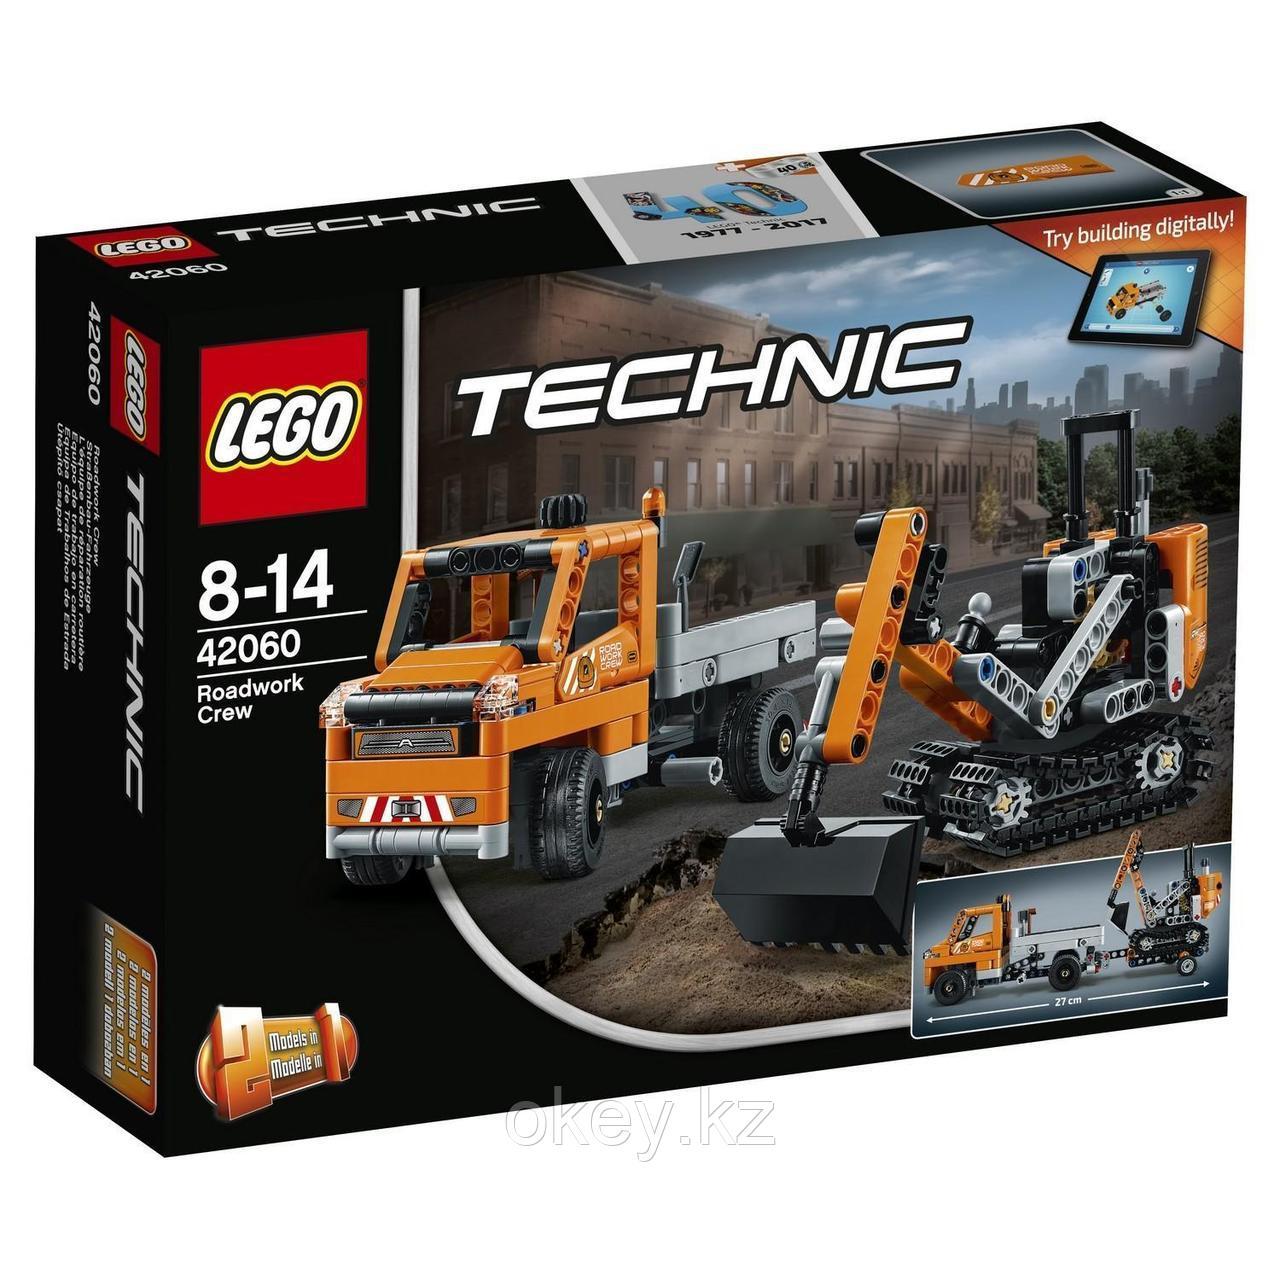 LEGO Technic: Дорожная техника 42060